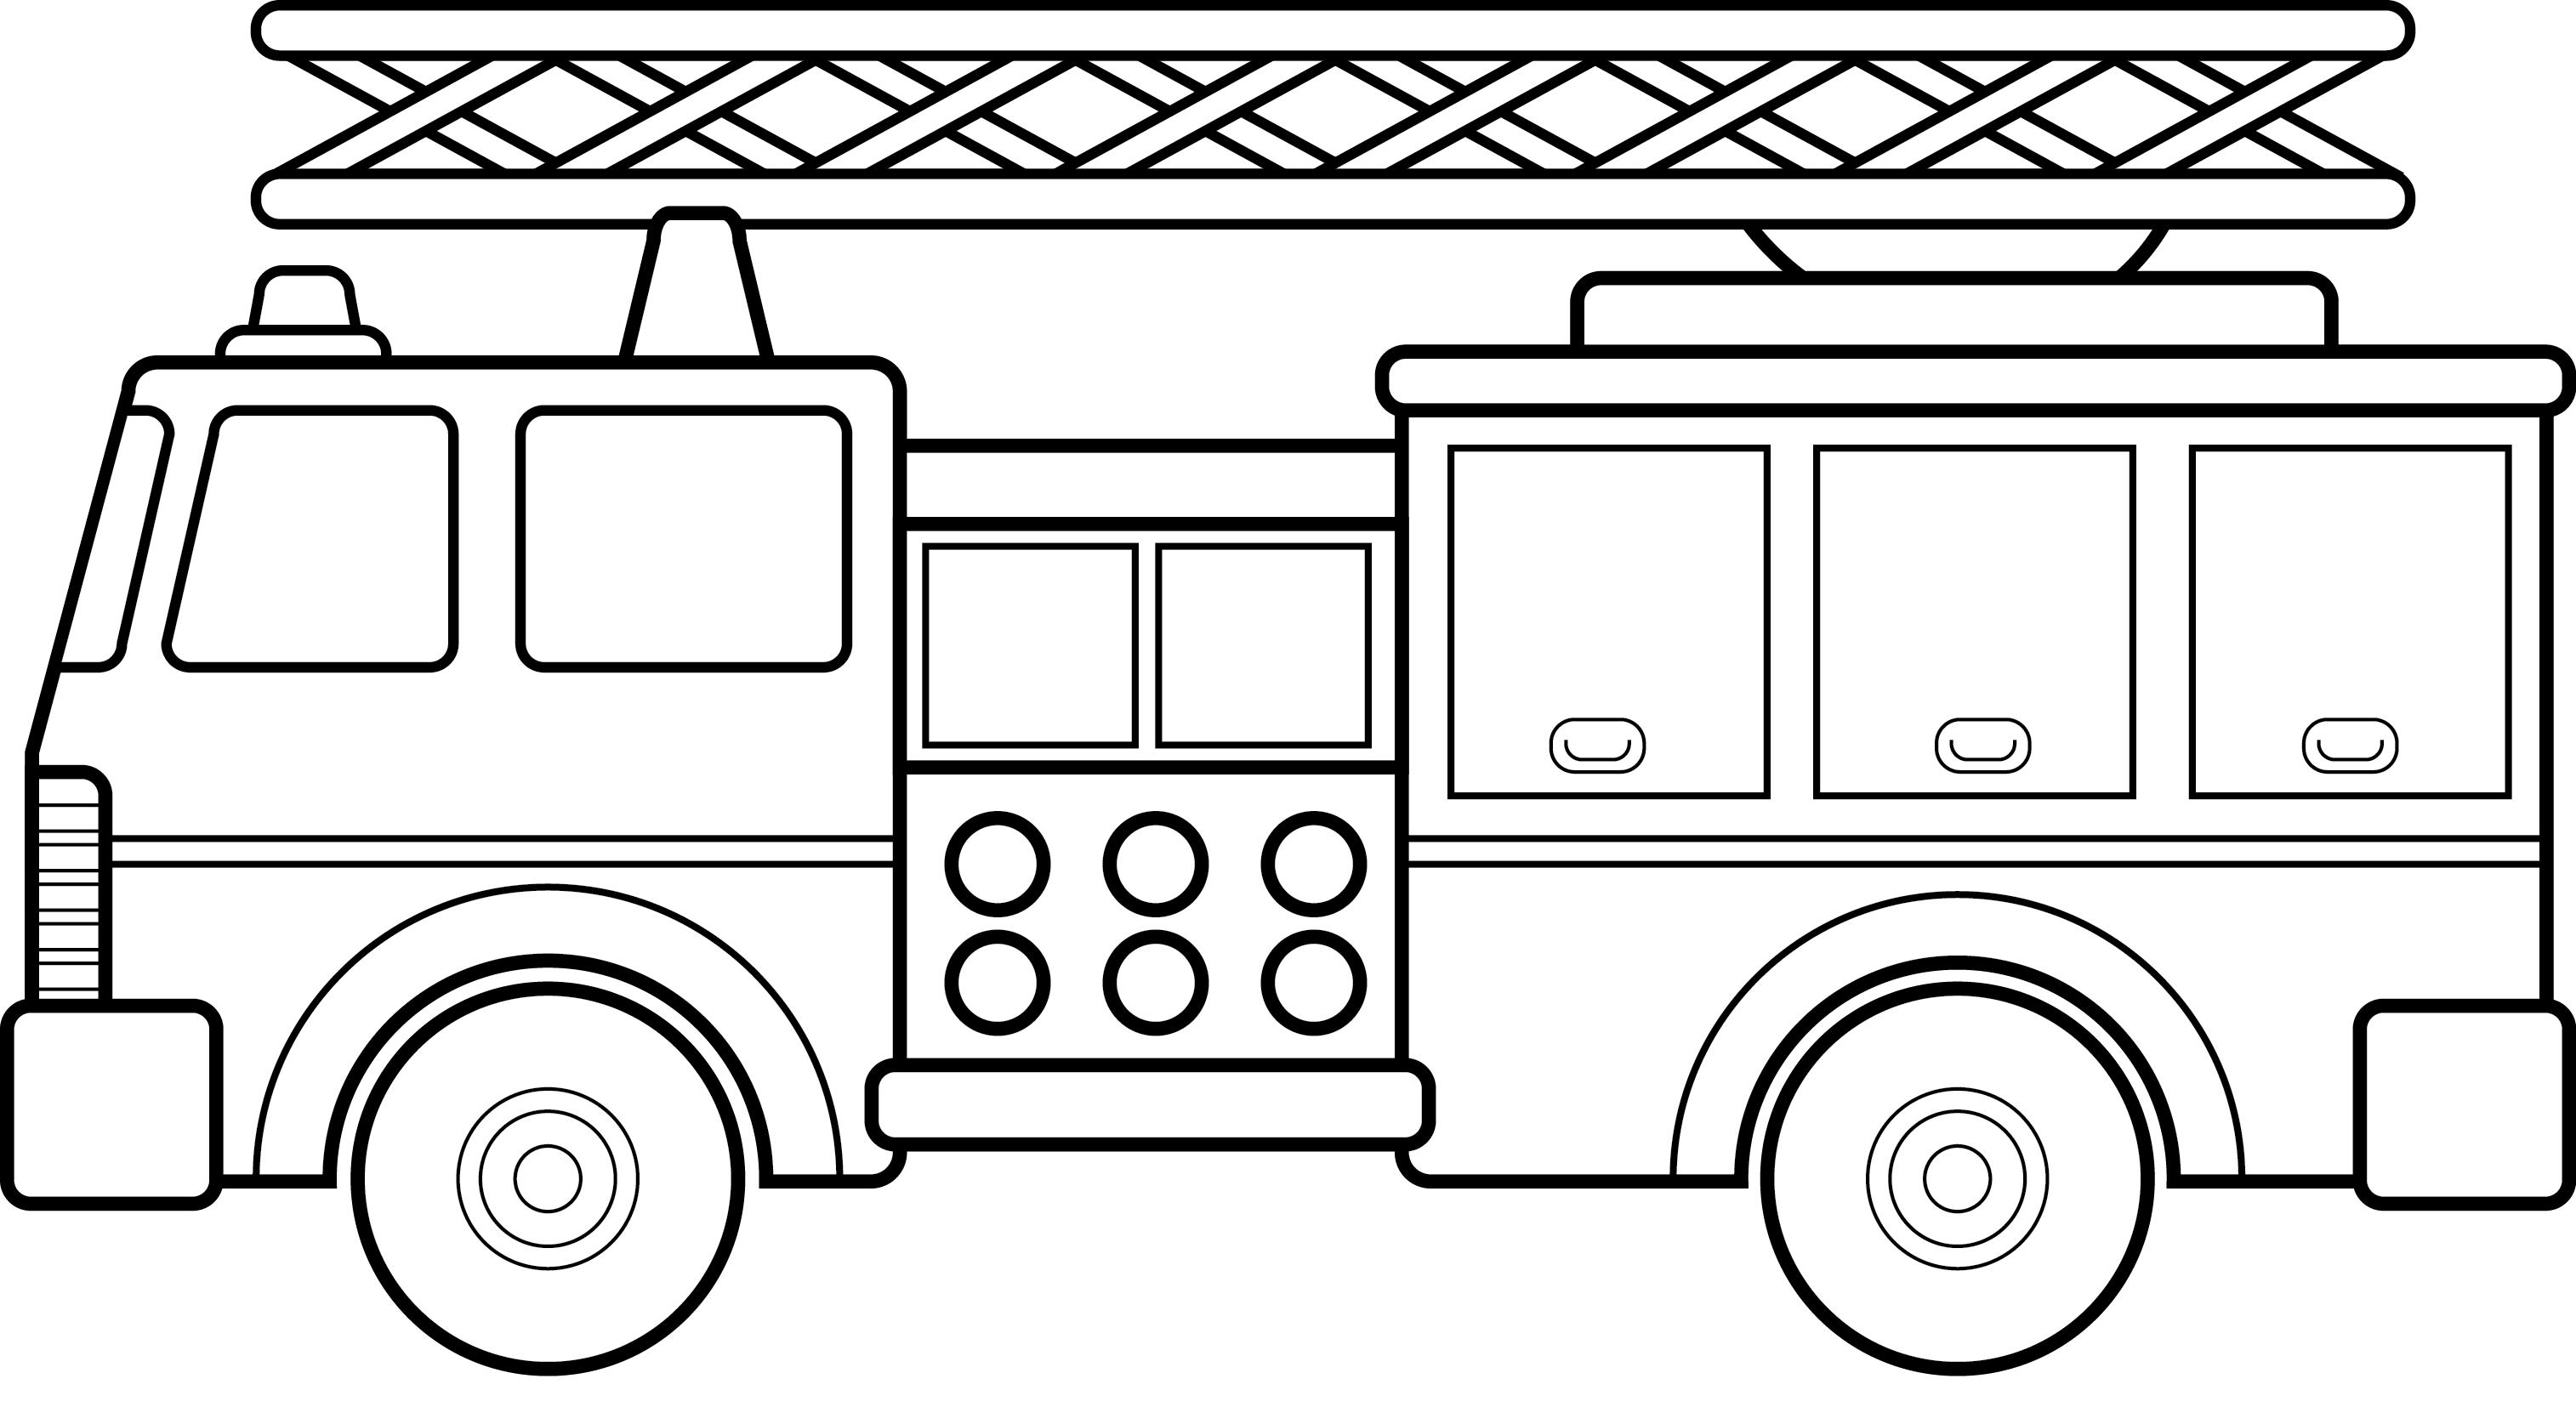 Firetruck clipart black and white. Fire truck panda free